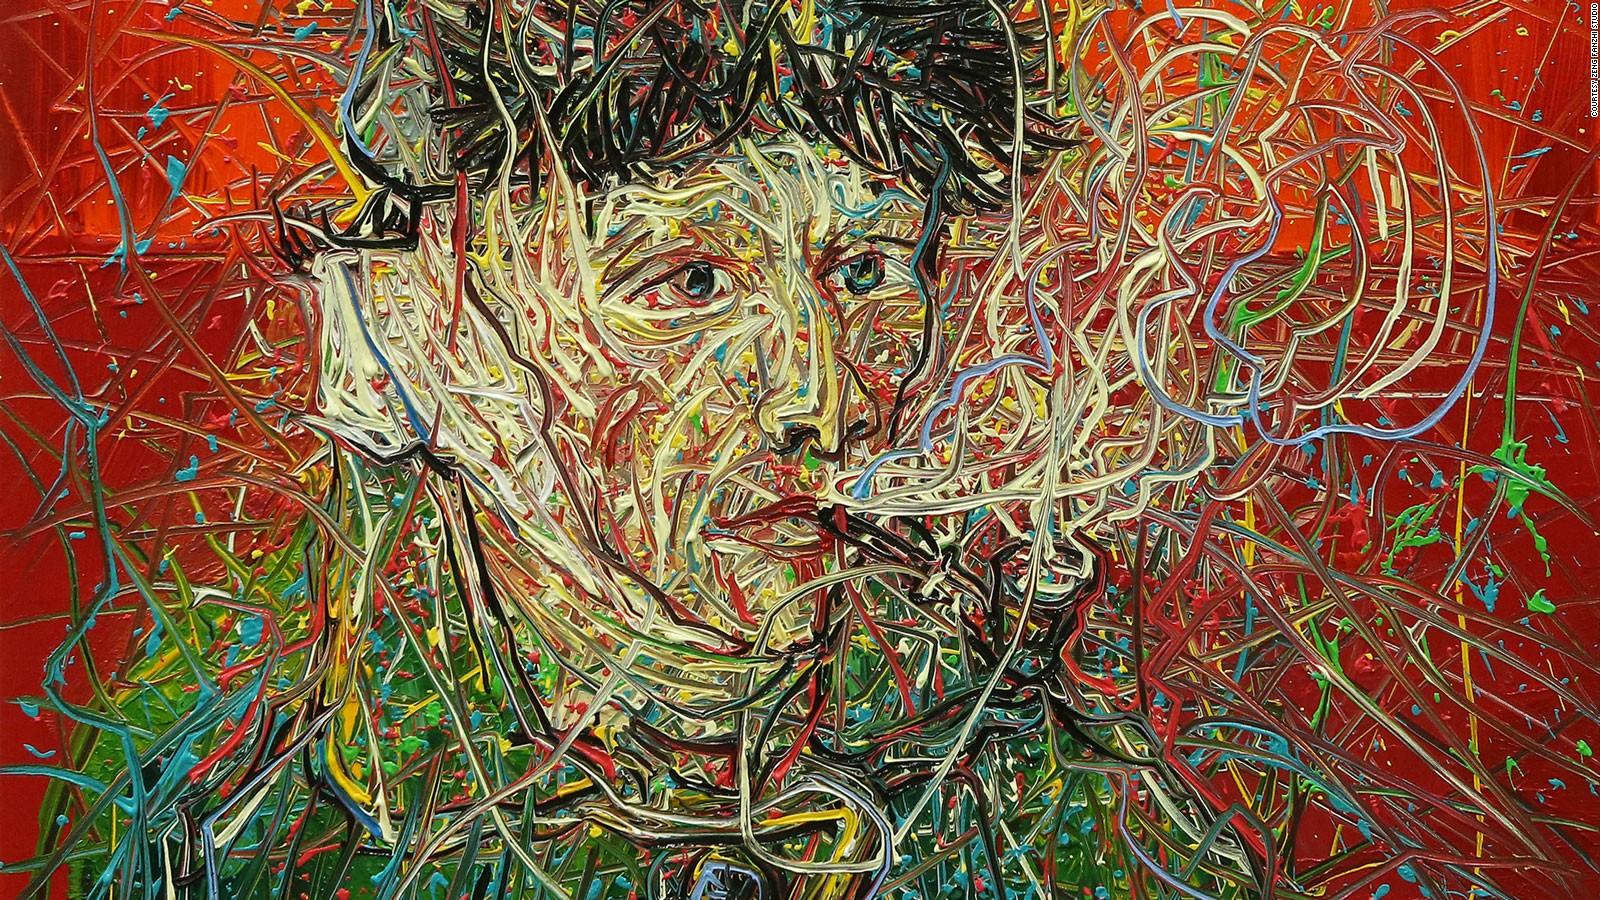 Zeng Fanzhi Recreates Van Gogh Self Portraits To Stunning Effect